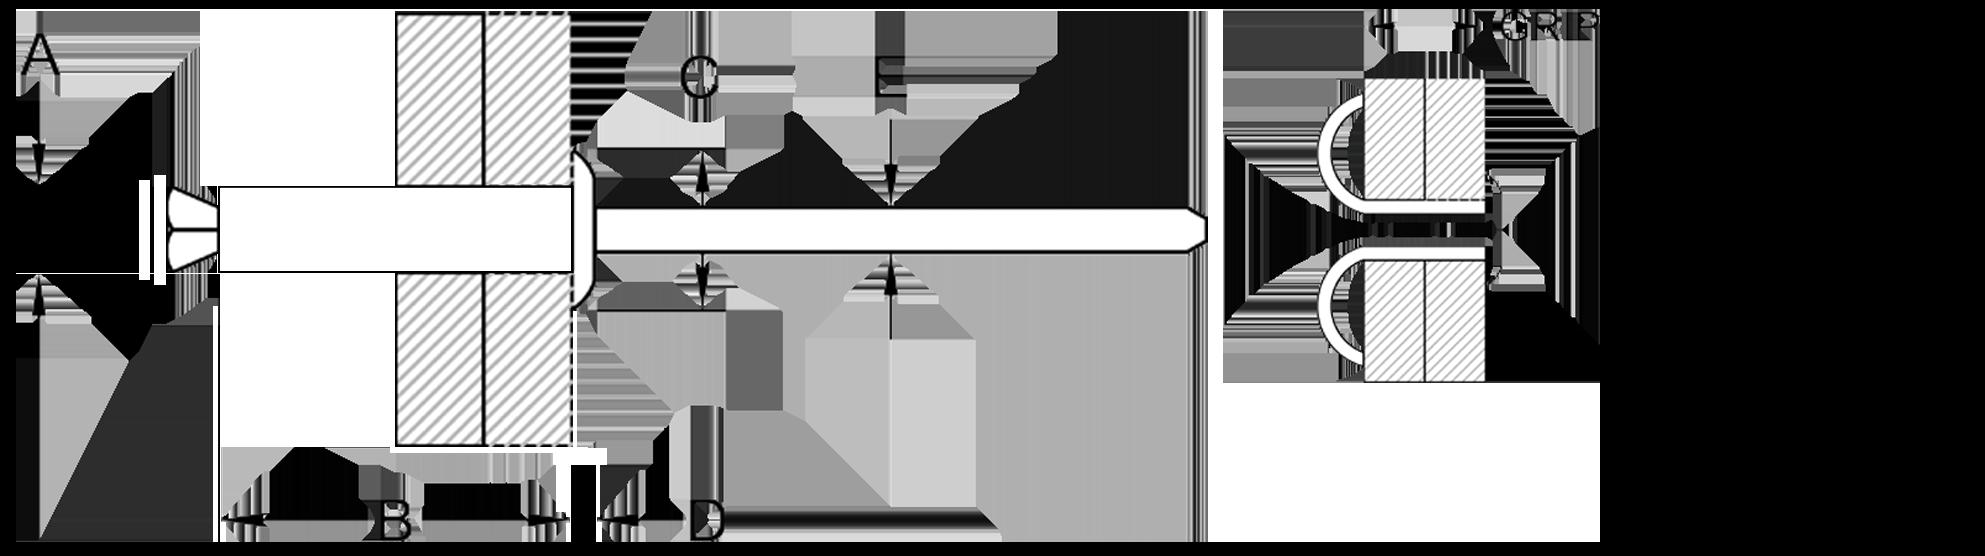 Rivtec® Peel Rivet Series